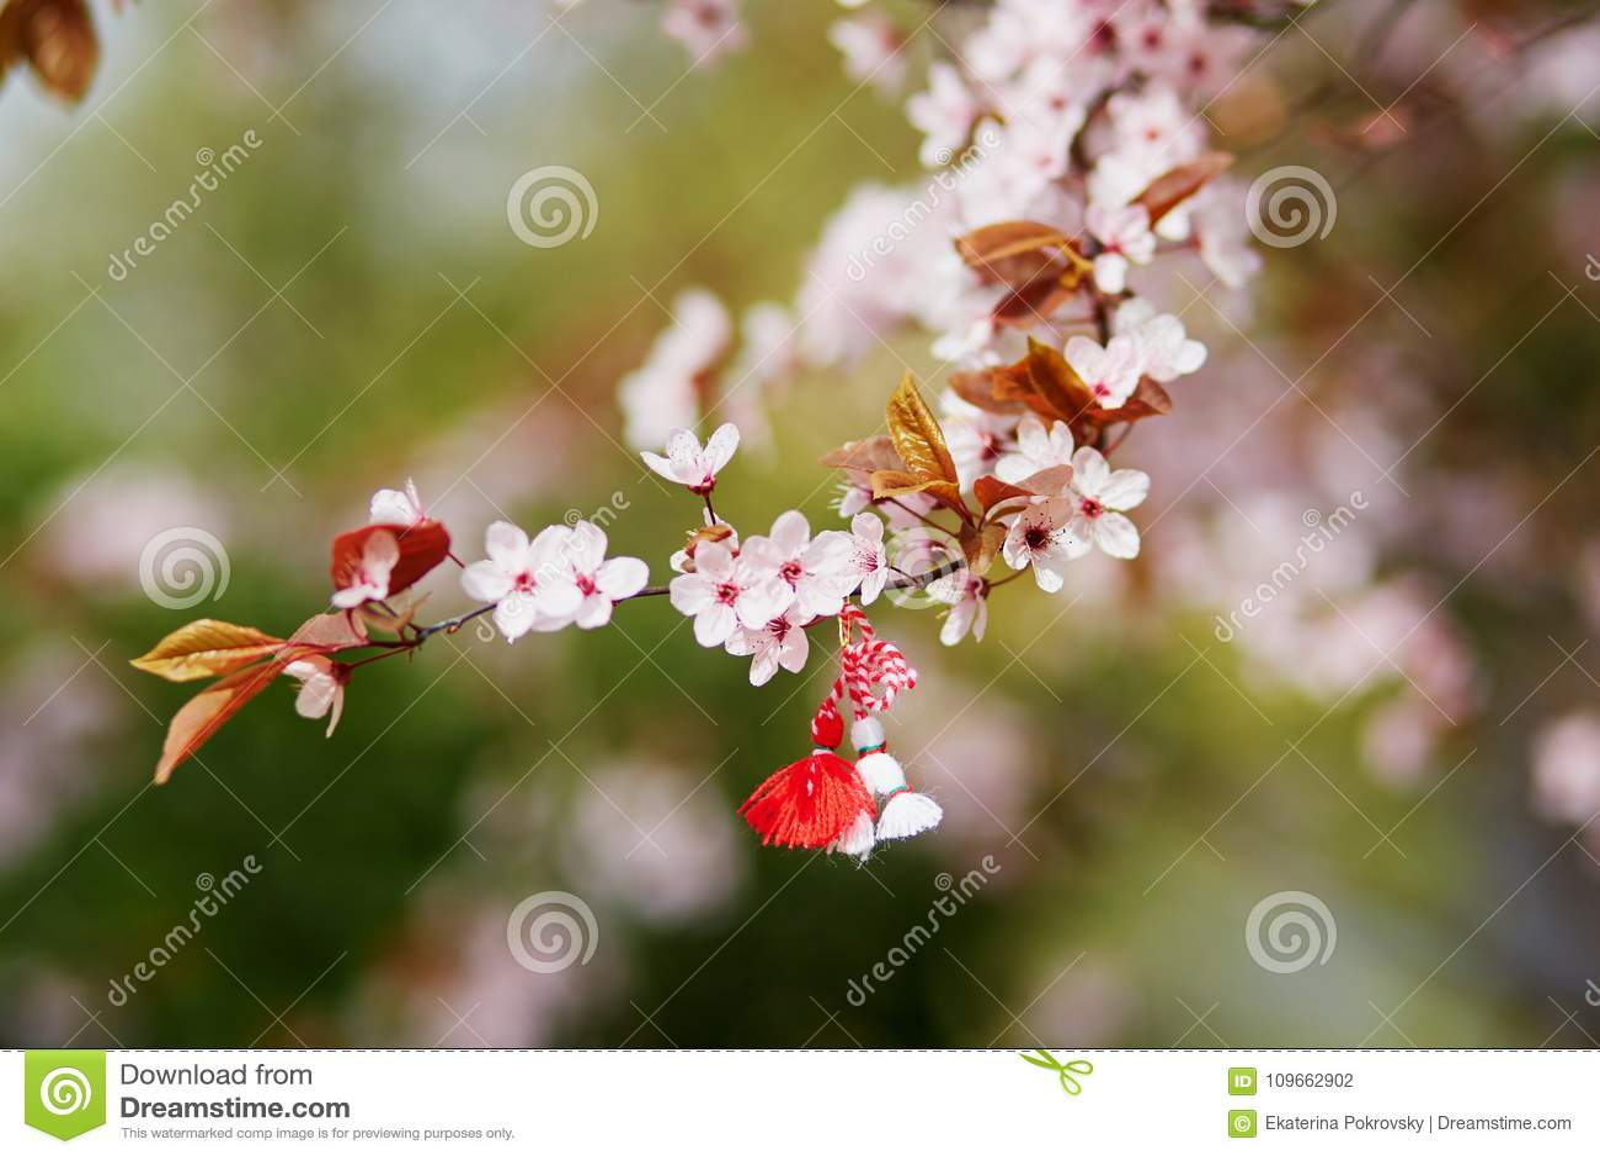 Niederlassung des Kirschbaums mit martisor, traditionelles Symbol des ersten Frühlingstages